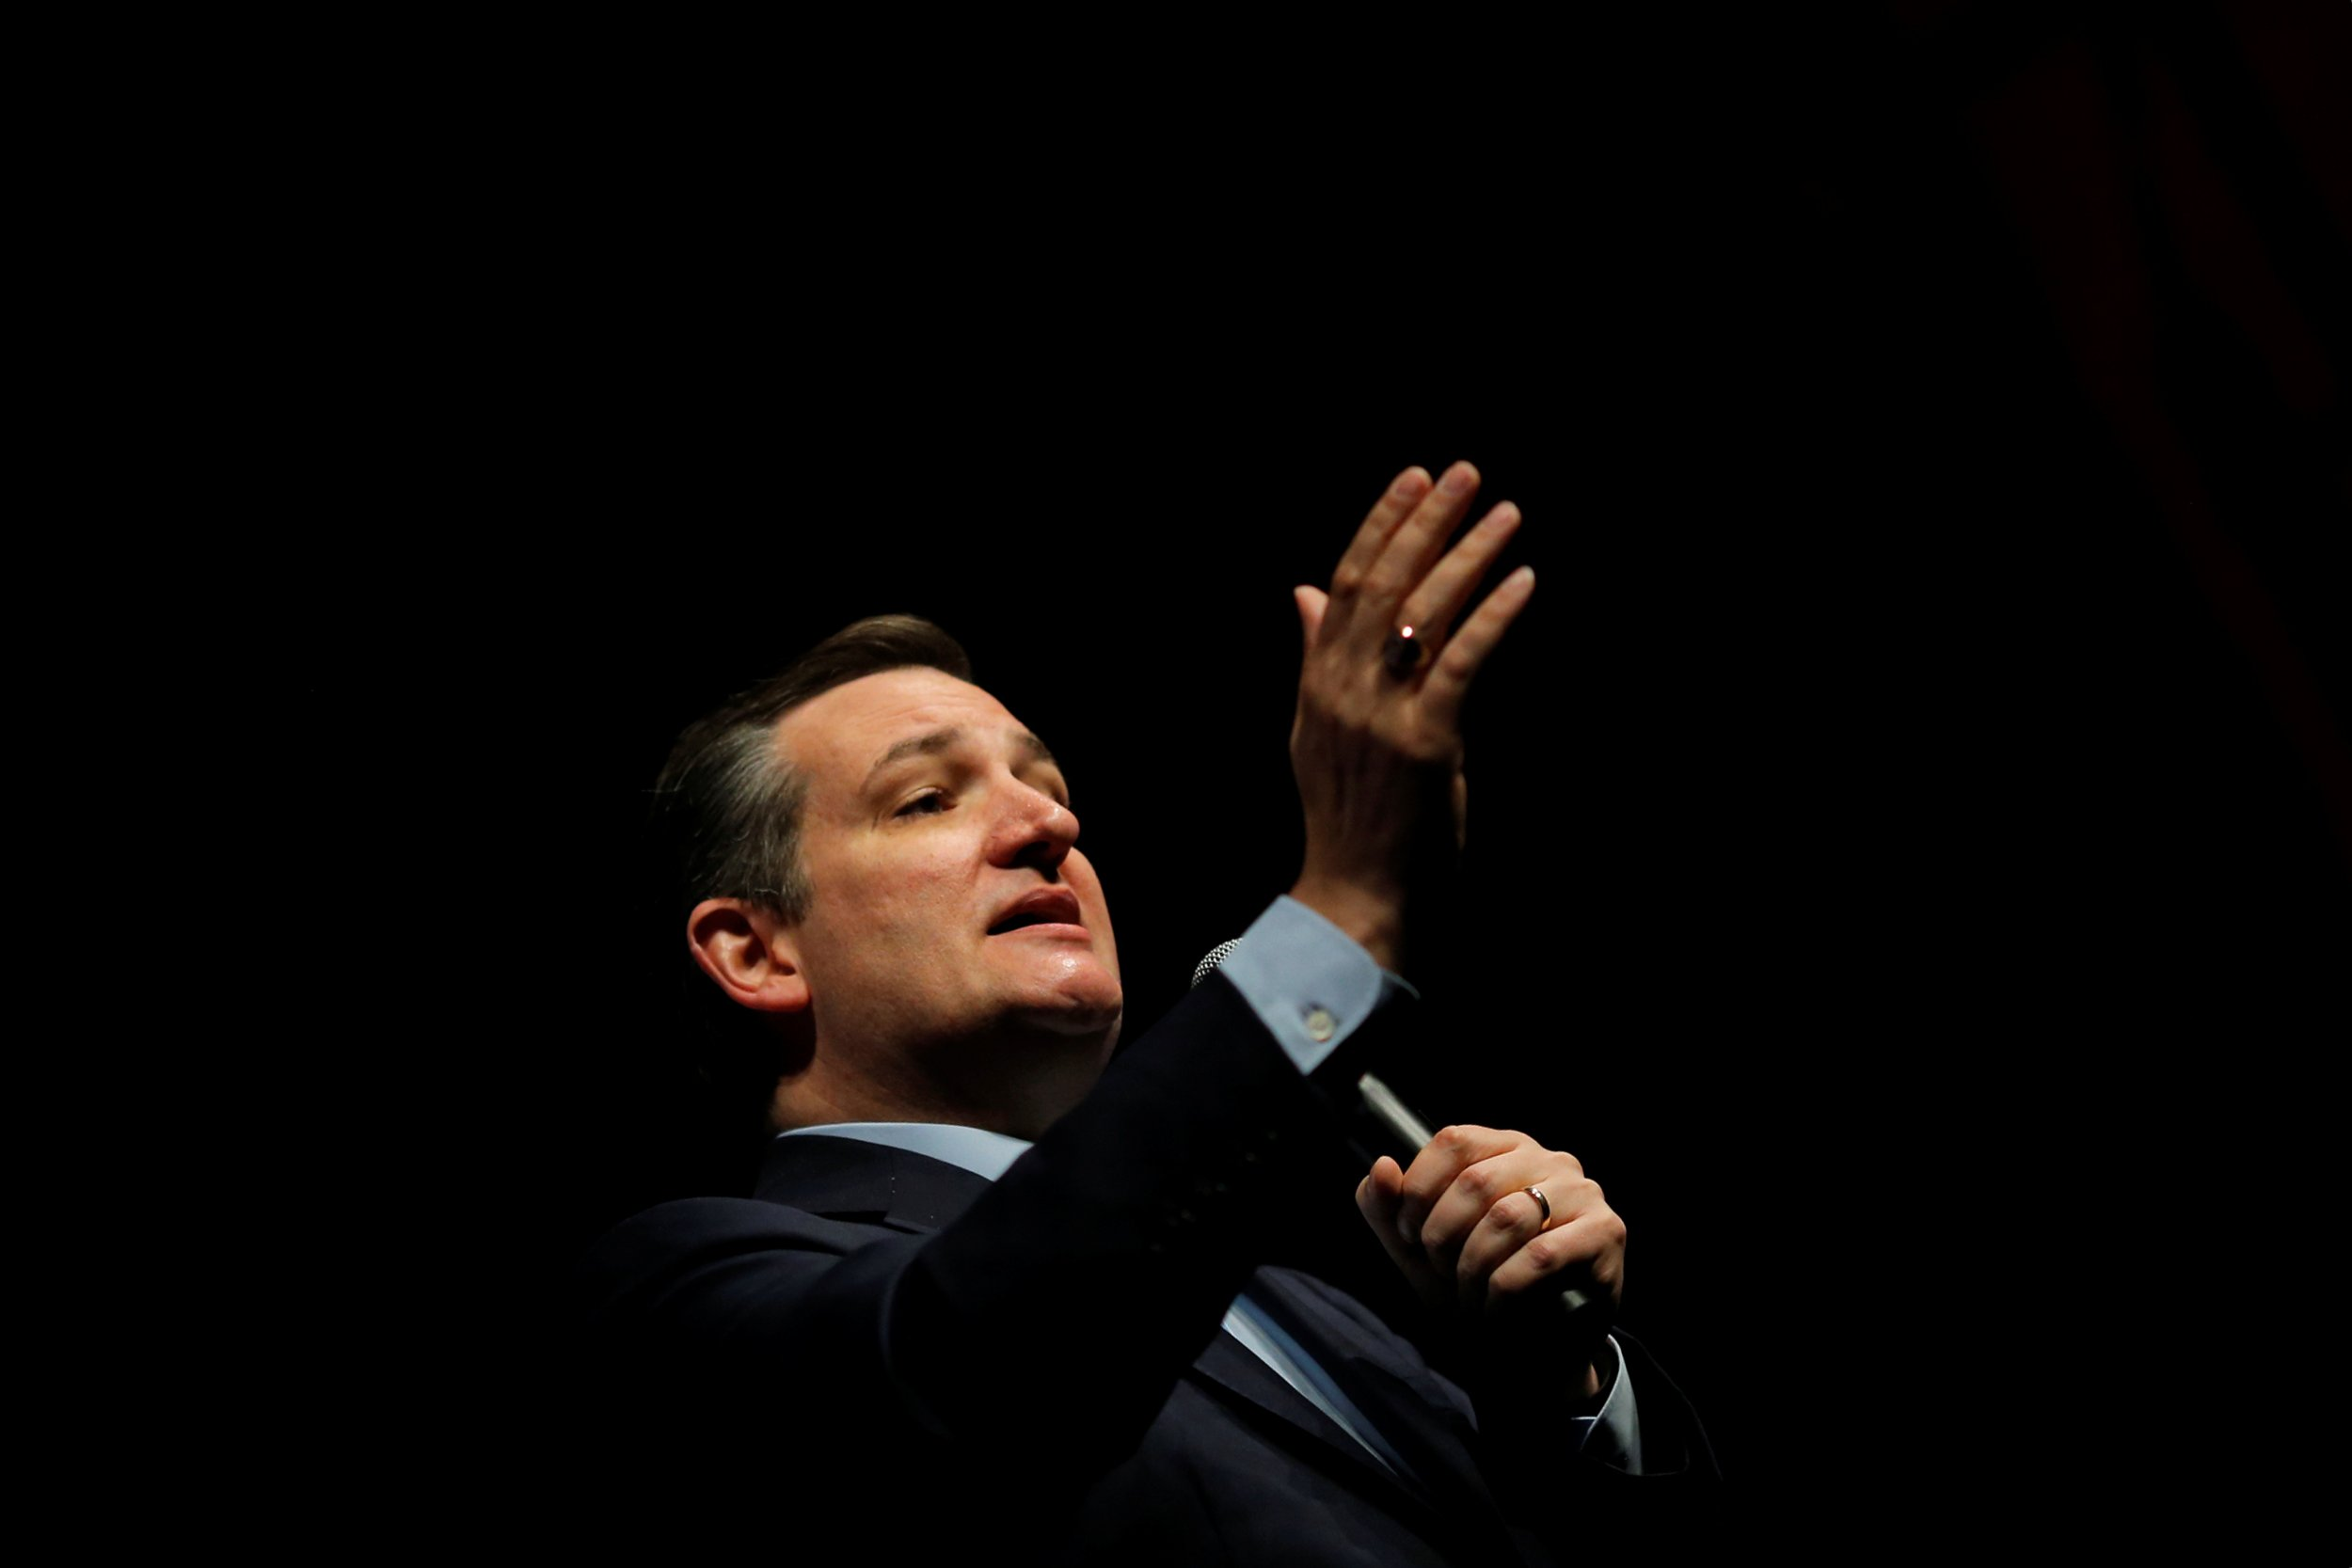 0510_Ted_Cruz_Donald_Trump_01